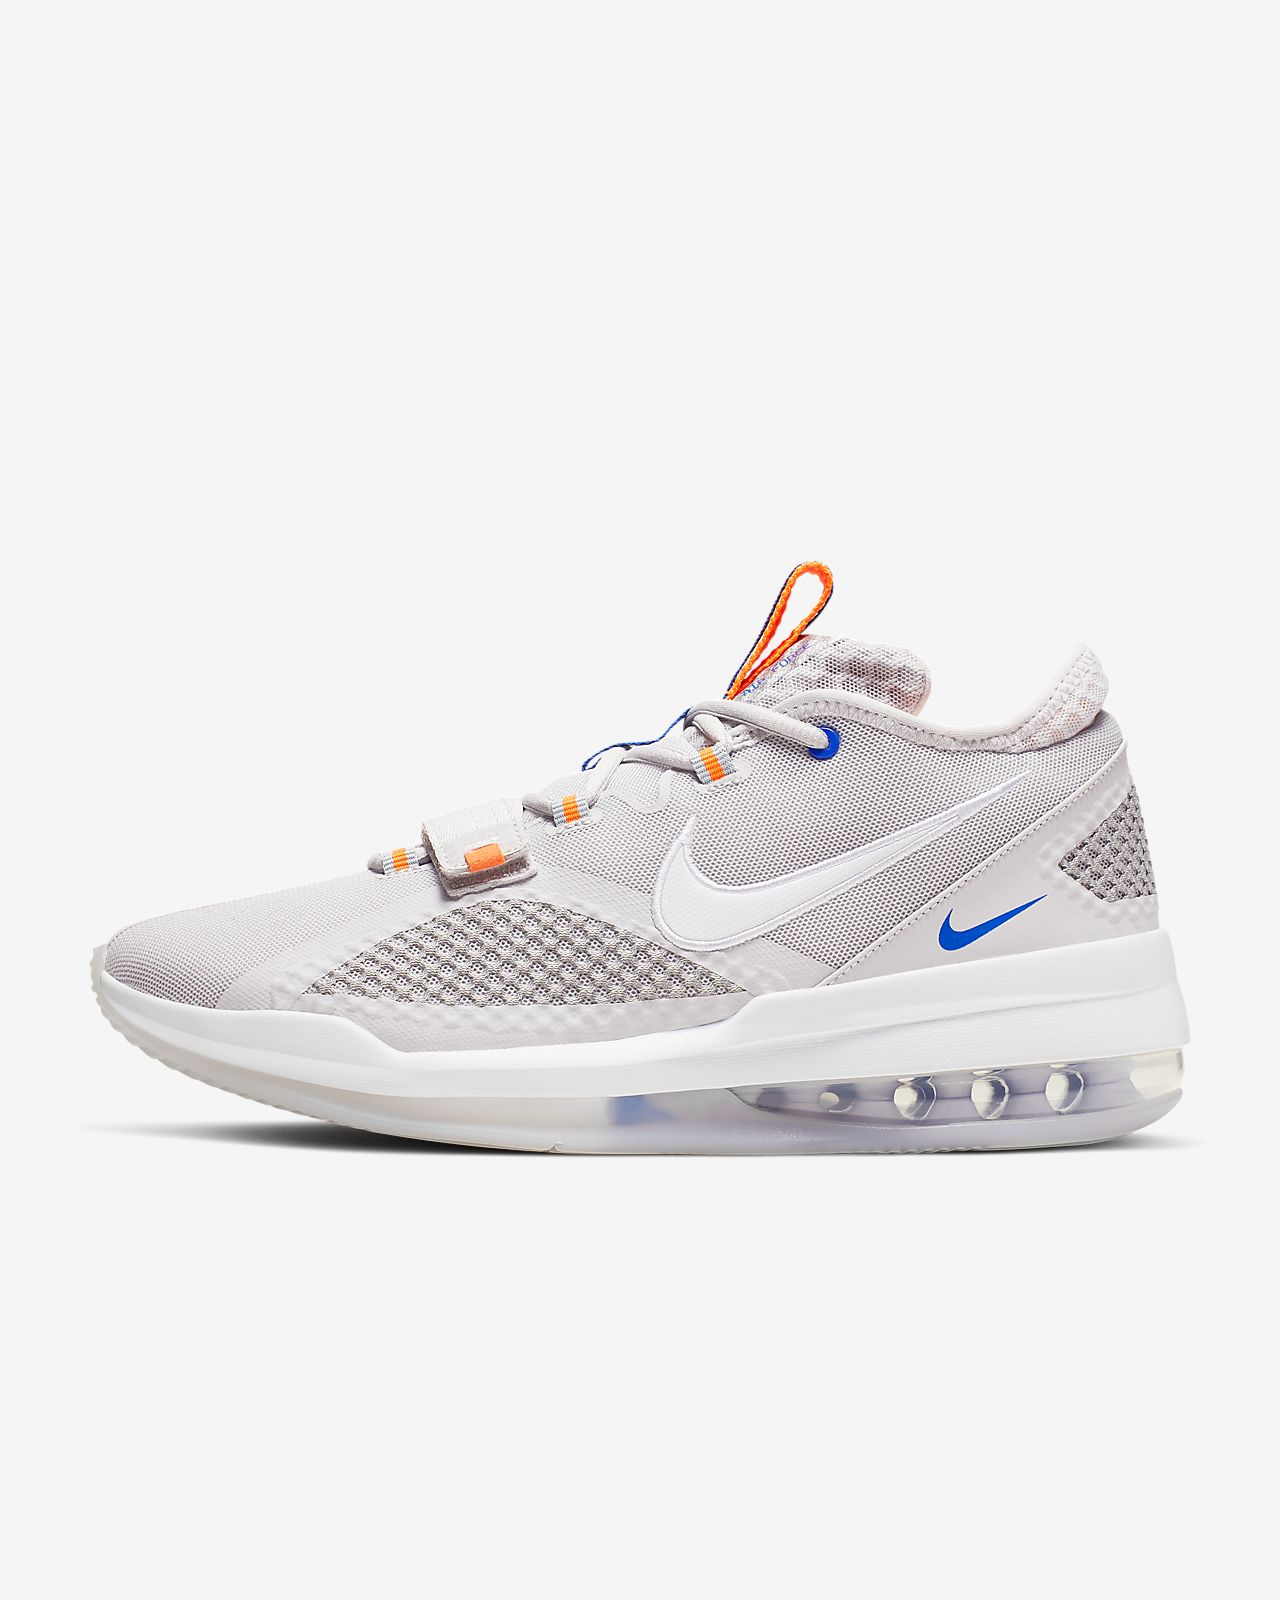 Basketbalová bota Nike Air Force Max Low